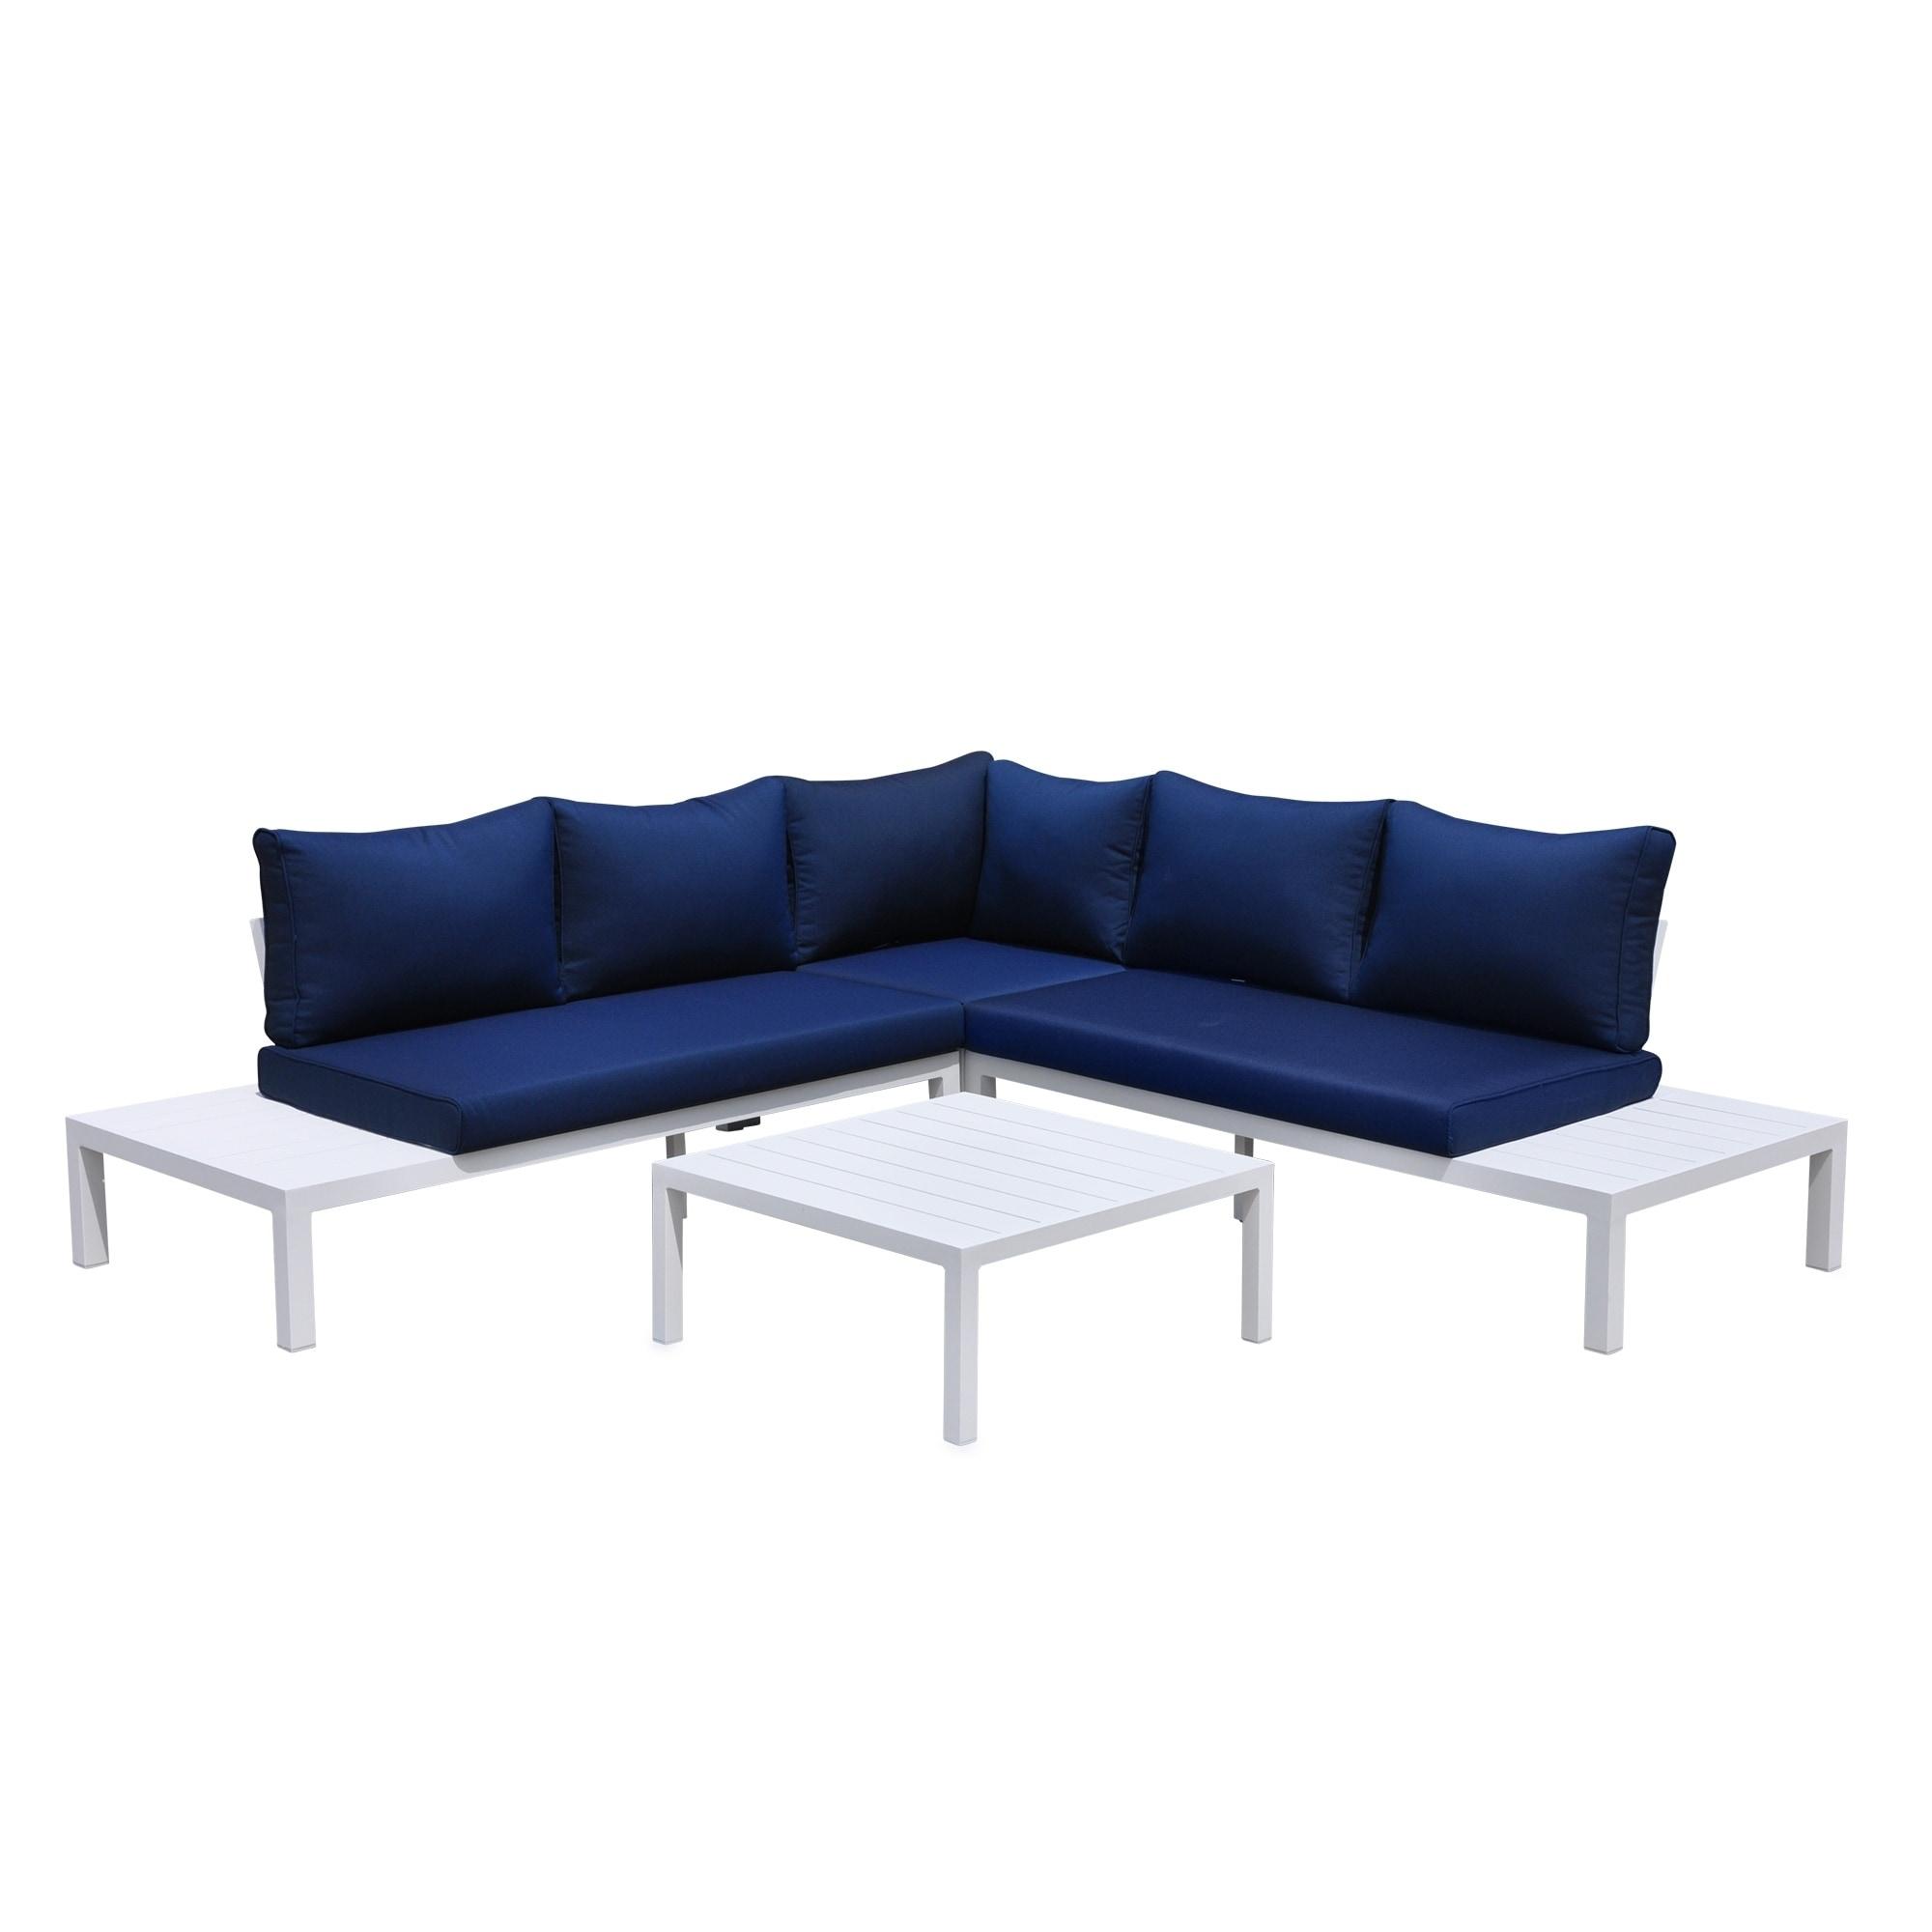 Admirable Courtyard Casual Osborne Aluminum Outdoor 4 Pc Sectional With Cushions Spiritservingveterans Wood Chair Design Ideas Spiritservingveteransorg